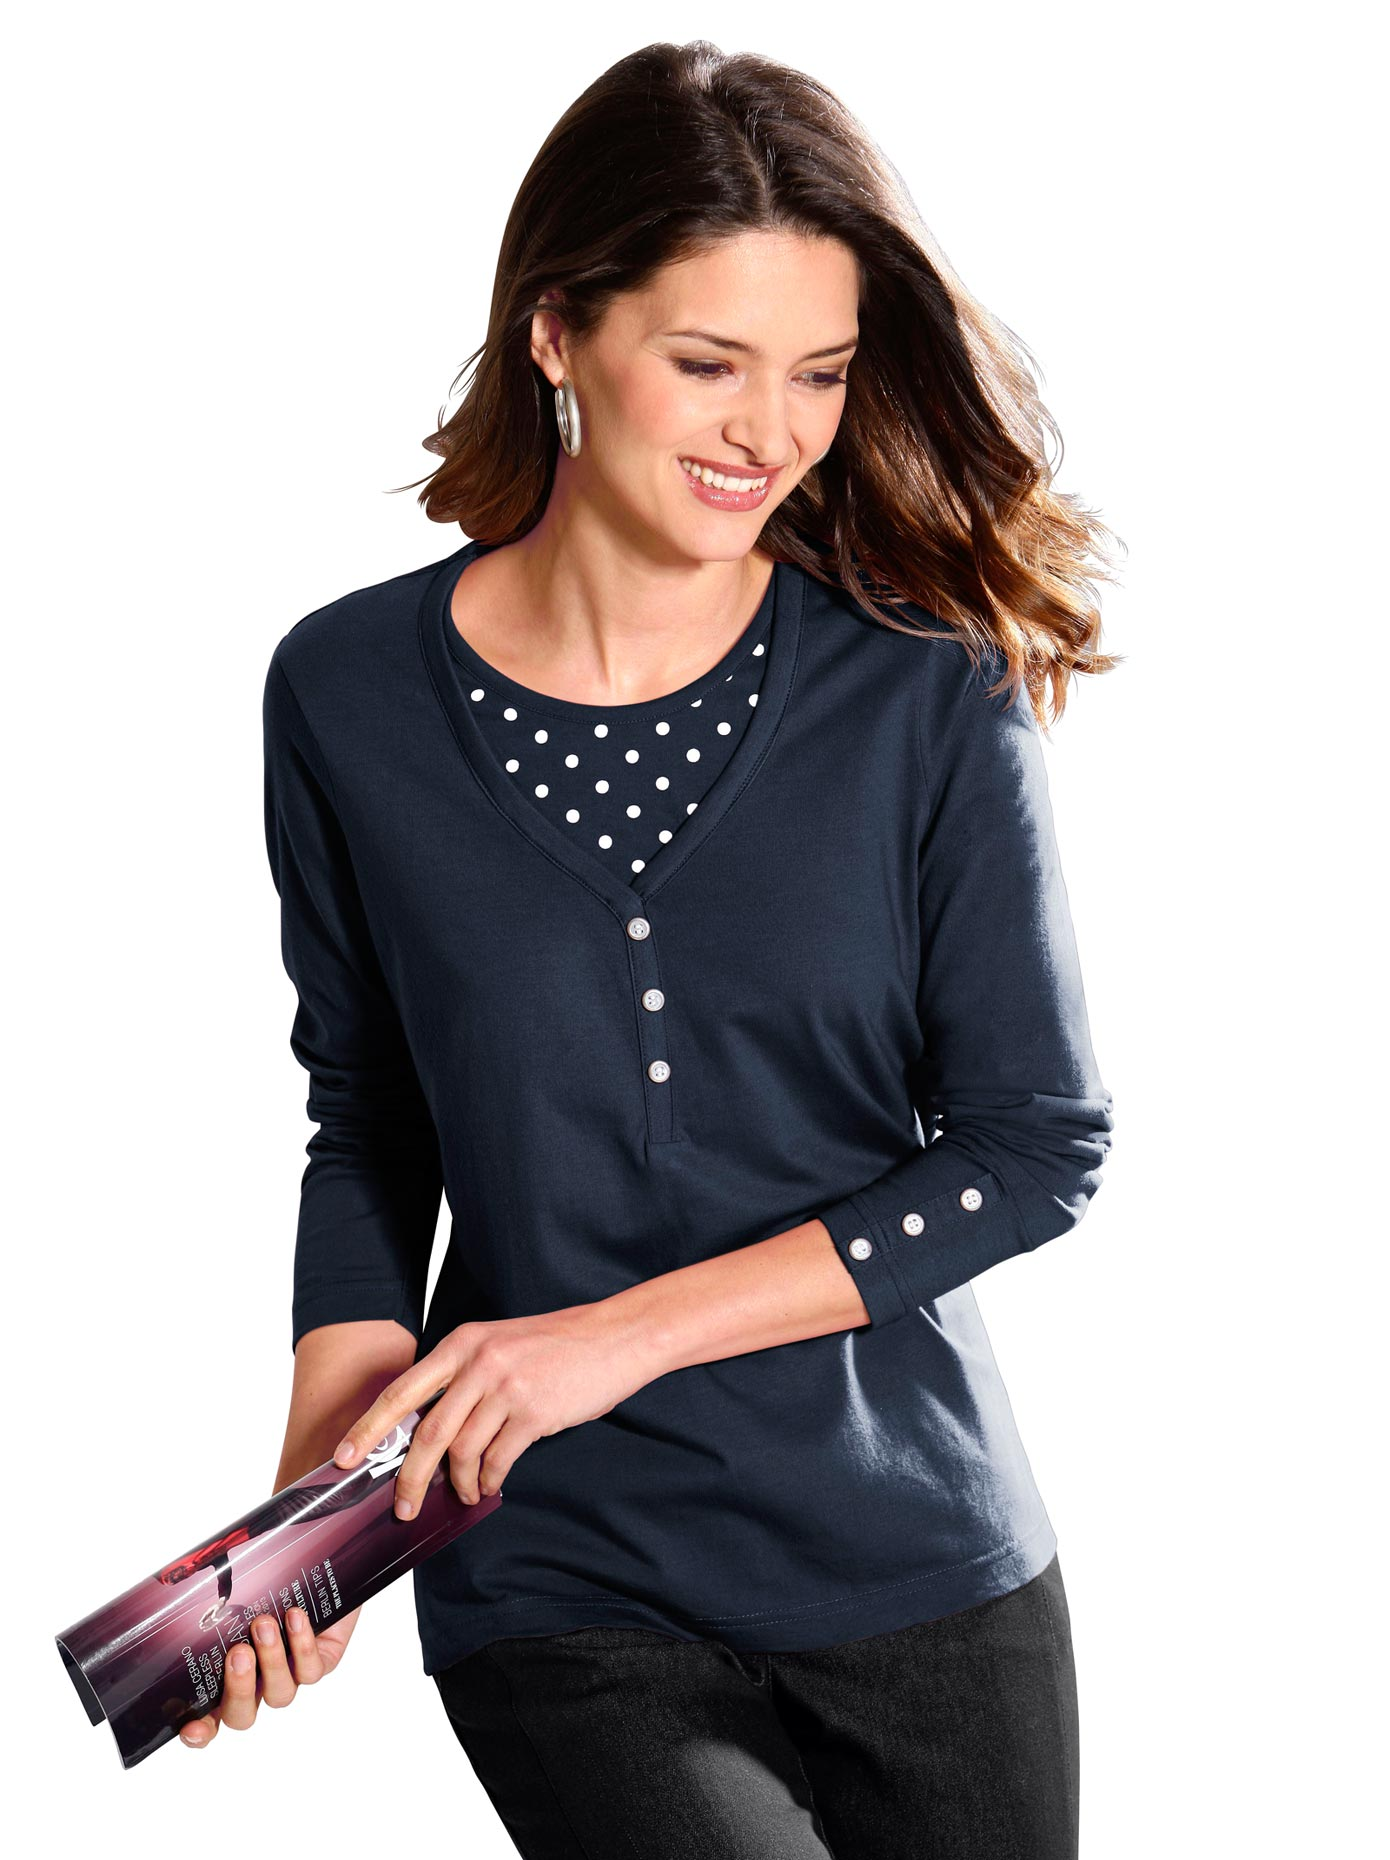 Classic Basics 2-in-1-Shirt im Tupfendessin | Bekleidung > Shirts > 2-in-1 Shirts | Blau | Classic Basics